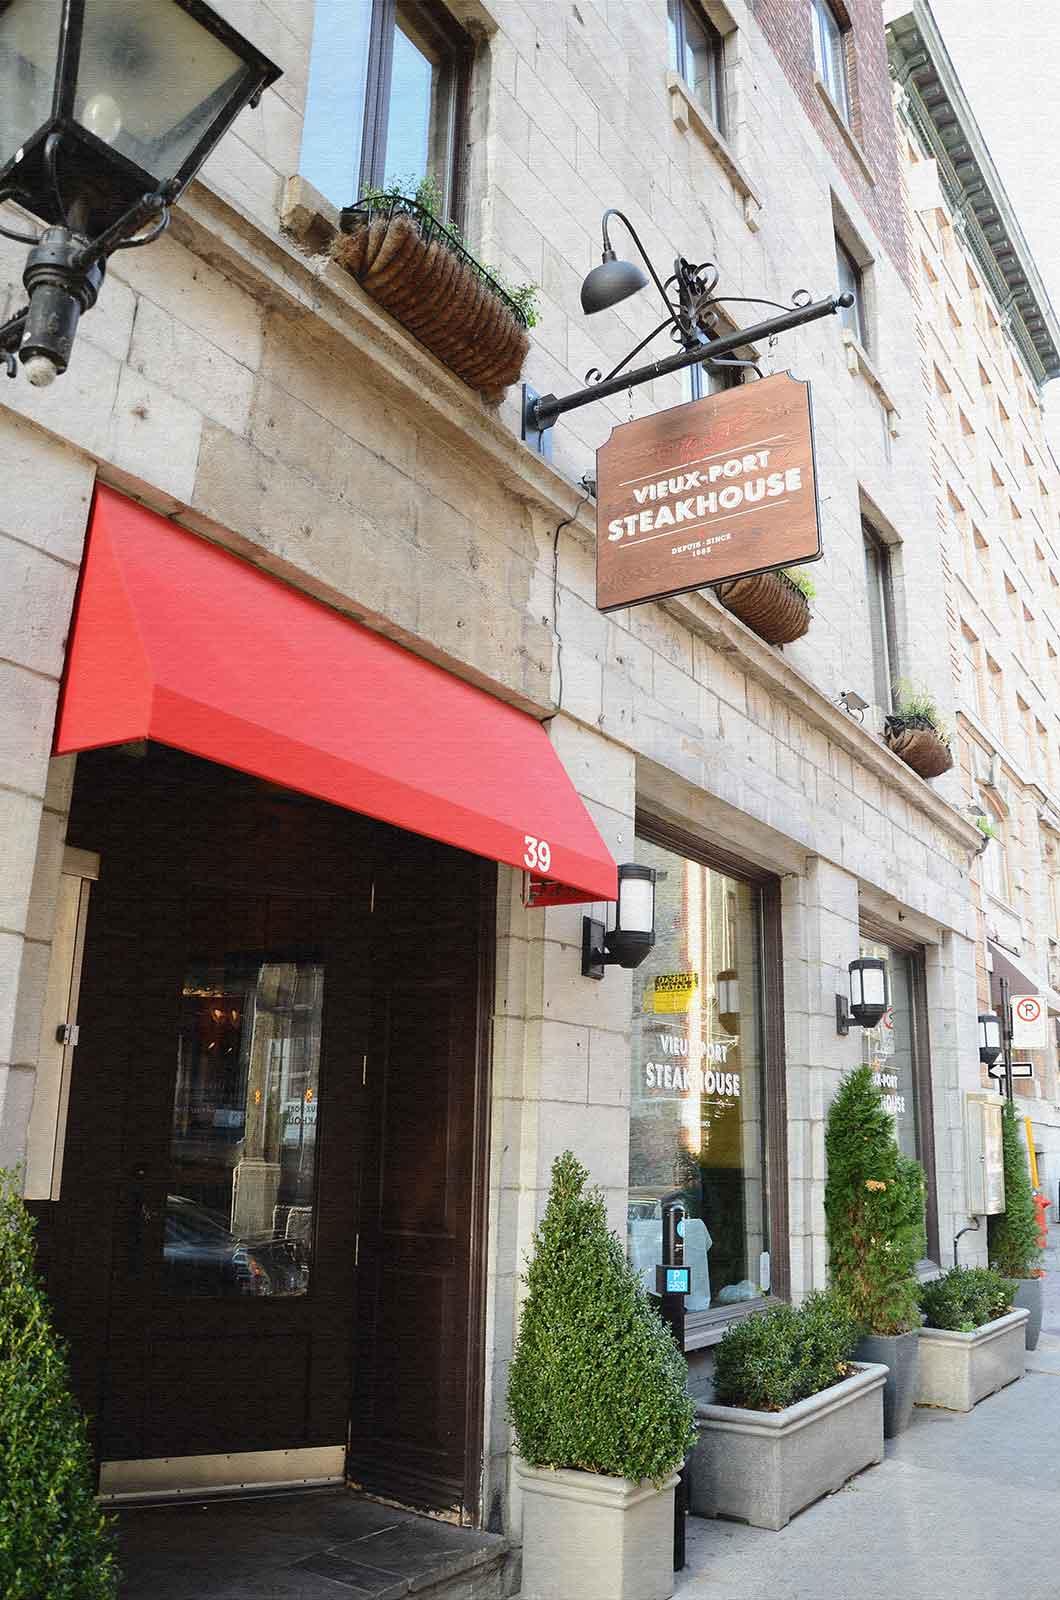 gicleurs restaurant Vieux-Port Steakhouse